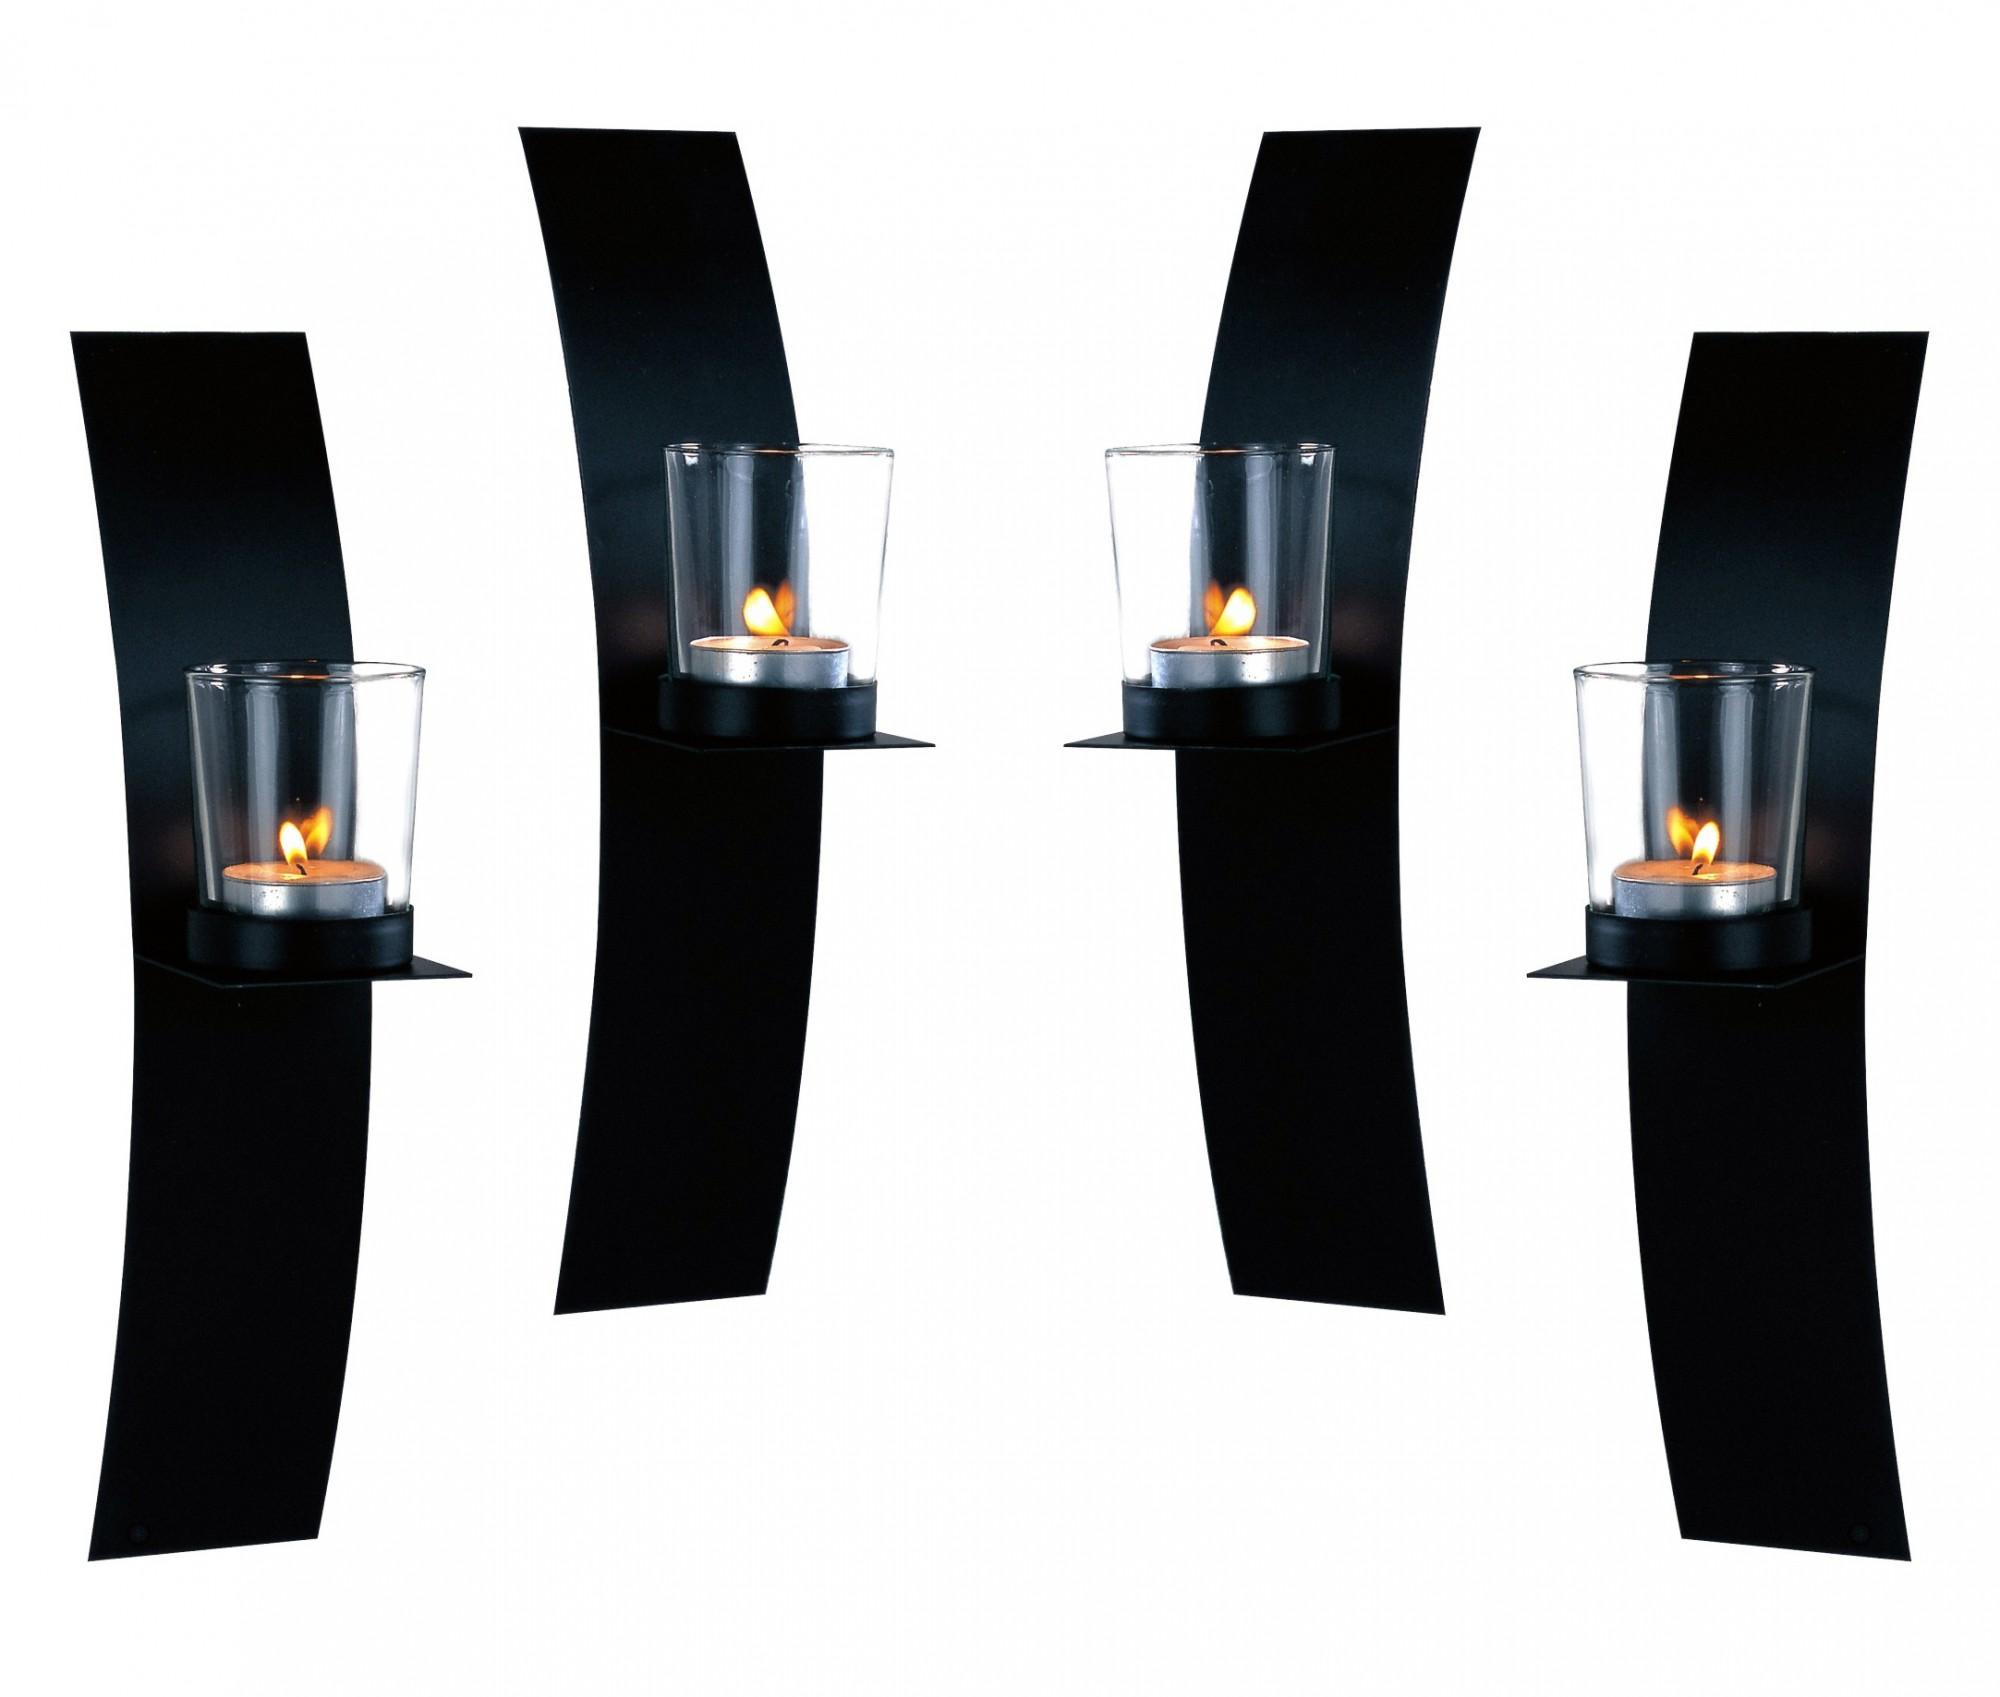 wand kerzenhalter 4er set schwarz teelicht wandkerzenhalter wandleuchter metall ebay. Black Bedroom Furniture Sets. Home Design Ideas